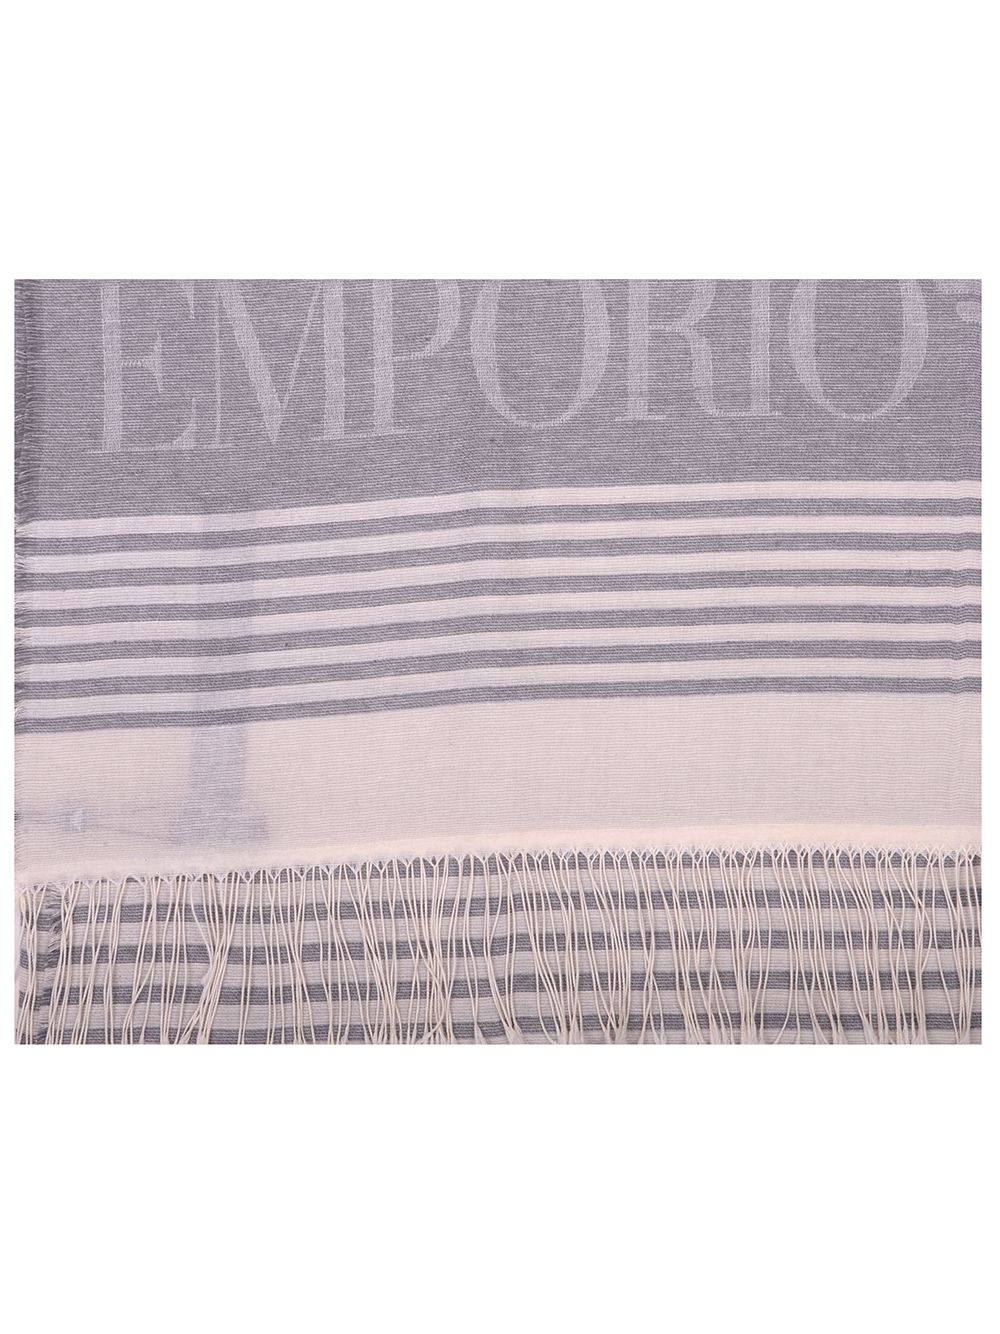 EMPORIO ARMANI Εσάρπα γυναικεία 635256 0P318-240 ΓΚΡΙ